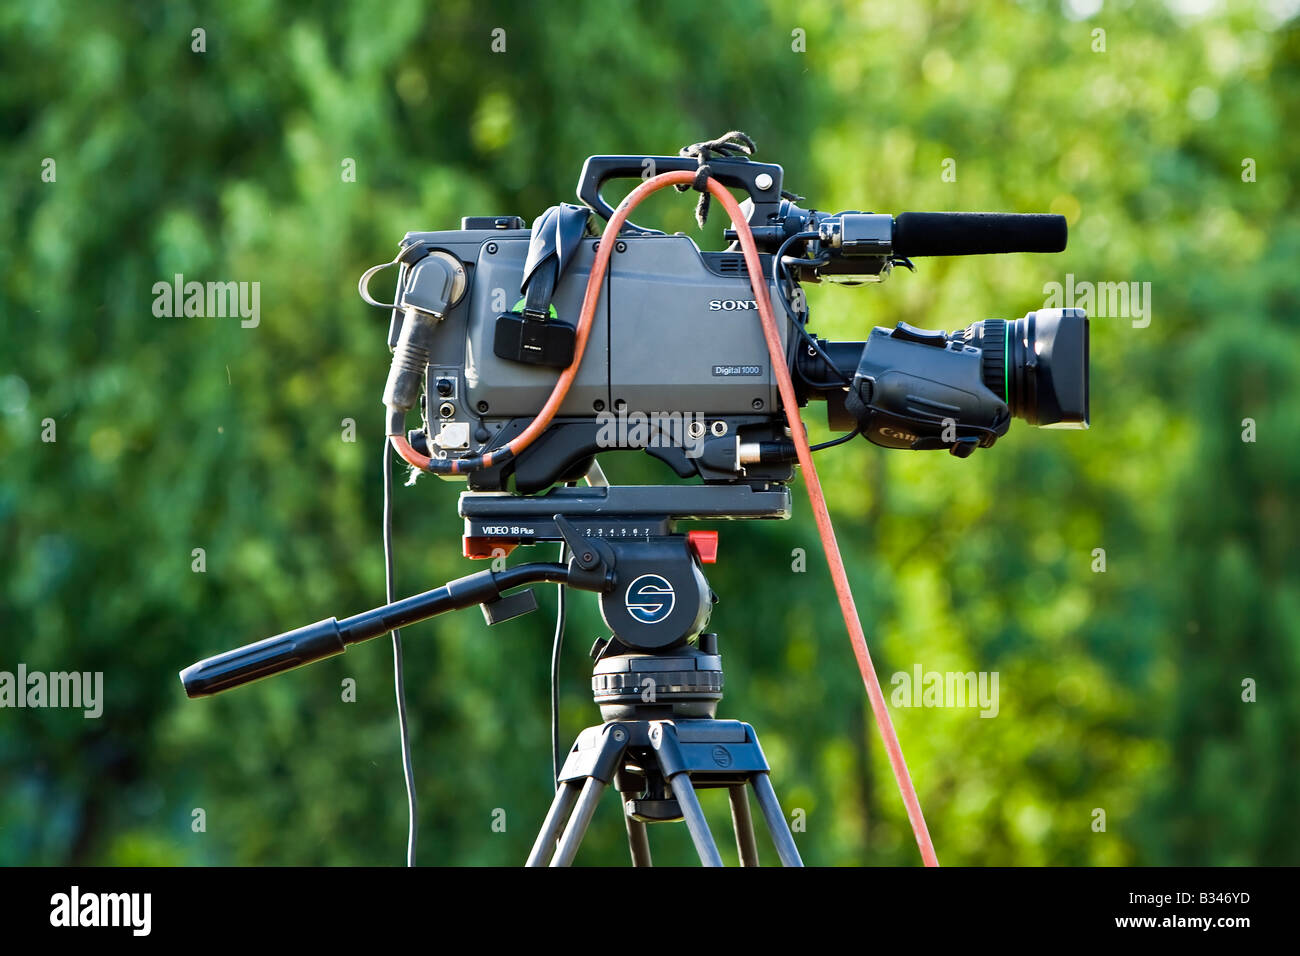 professional tv news camera - Stock Image